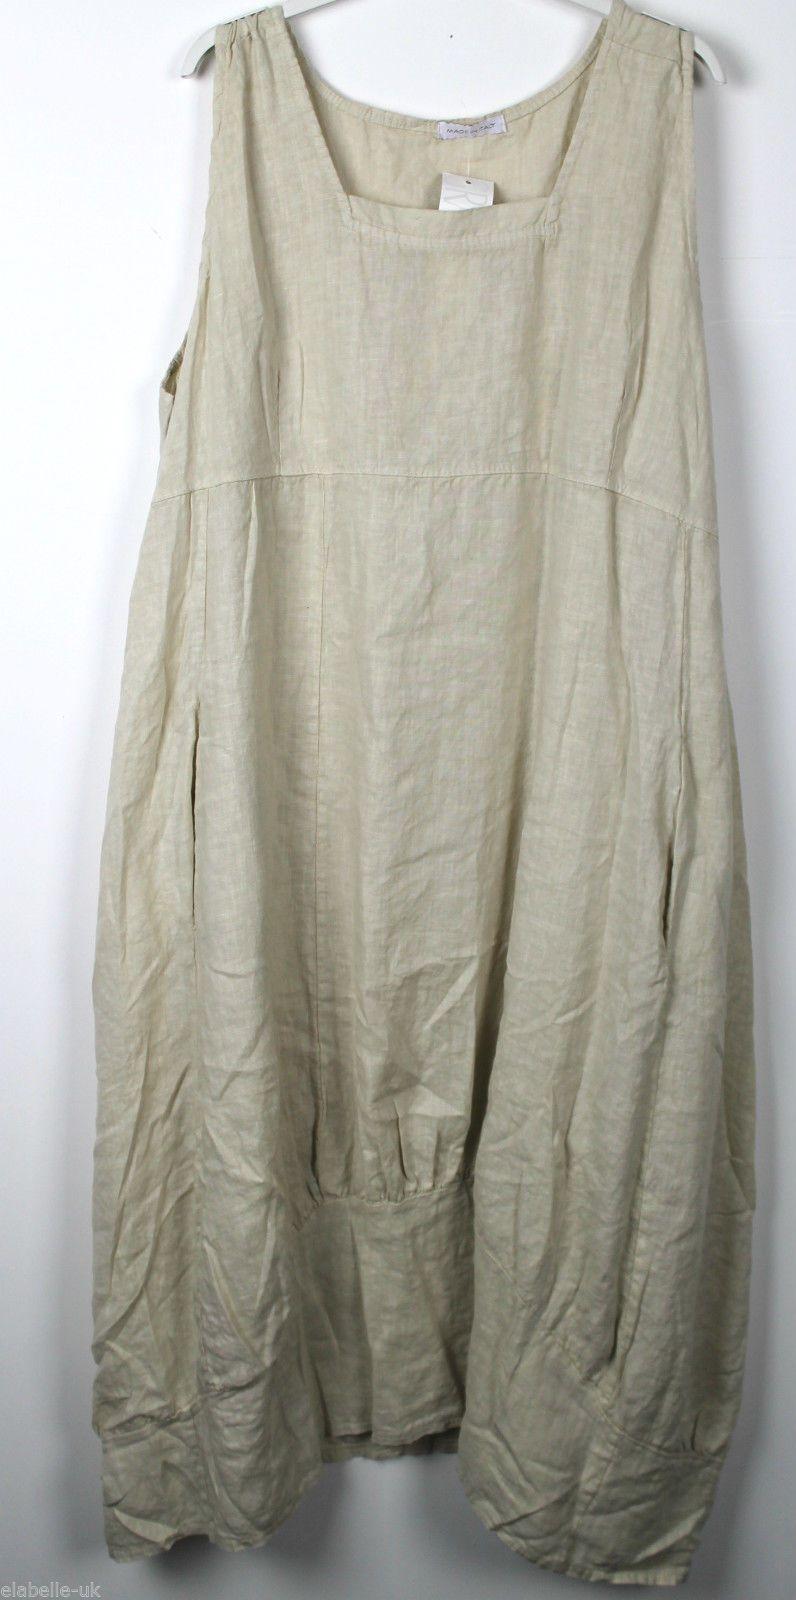 New ladies plain italian lagenlook quirky long boho pocket linen